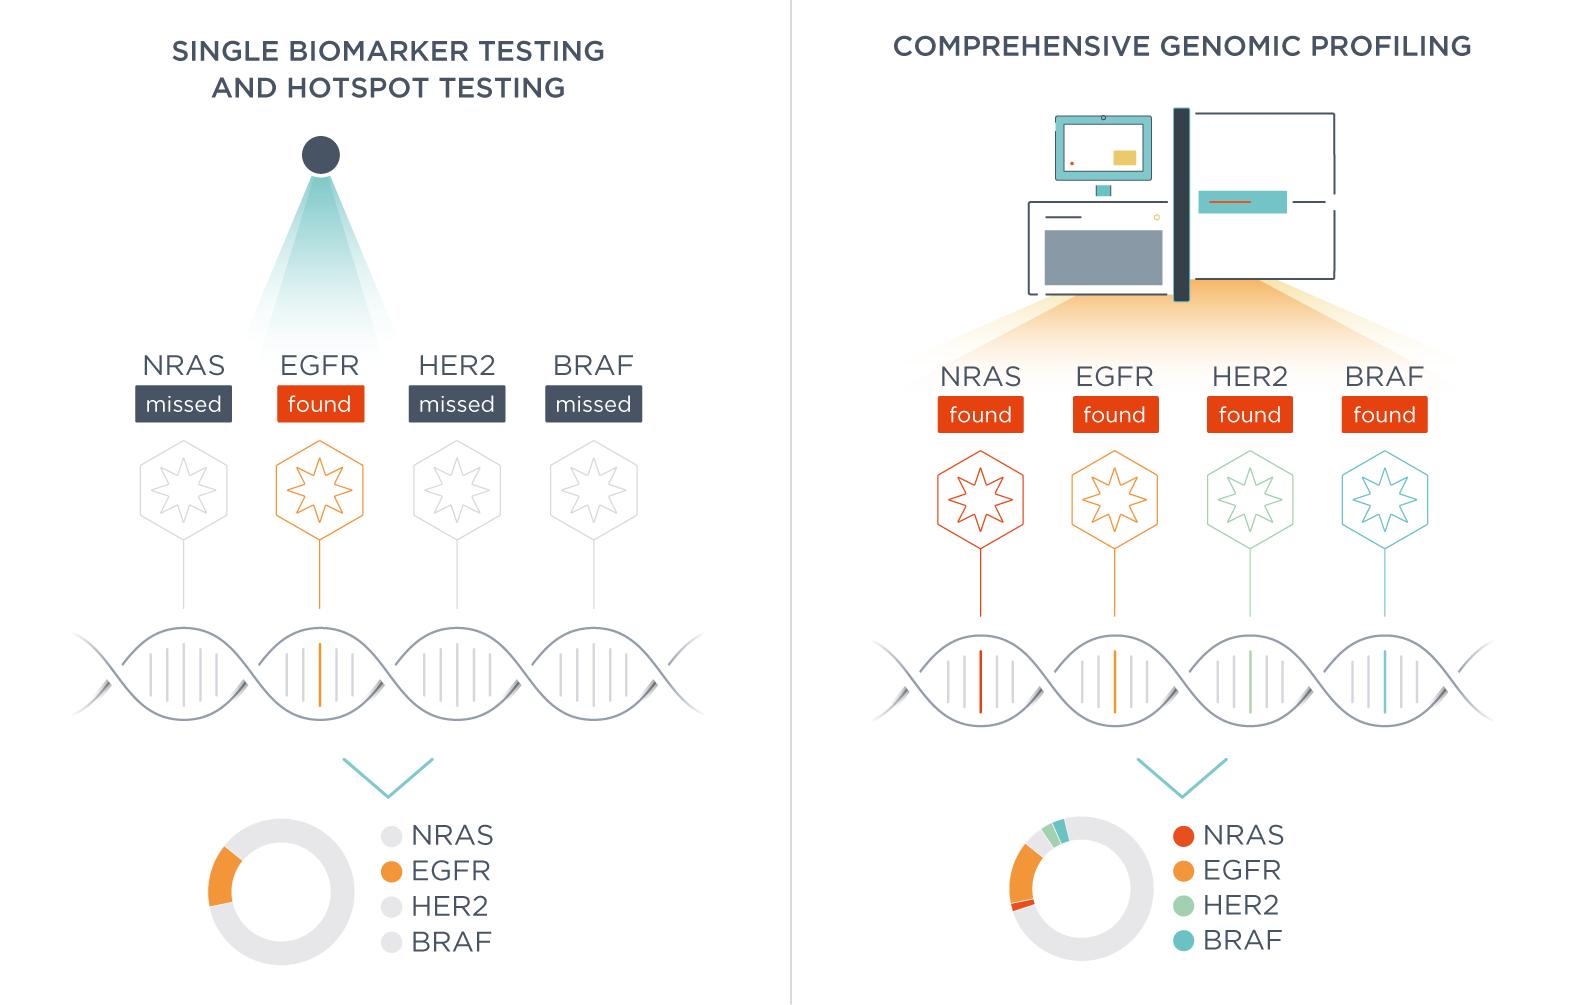 Testing your cancer sample: single biomarker testing, hotspot testing, and comprehensive genomic profiling